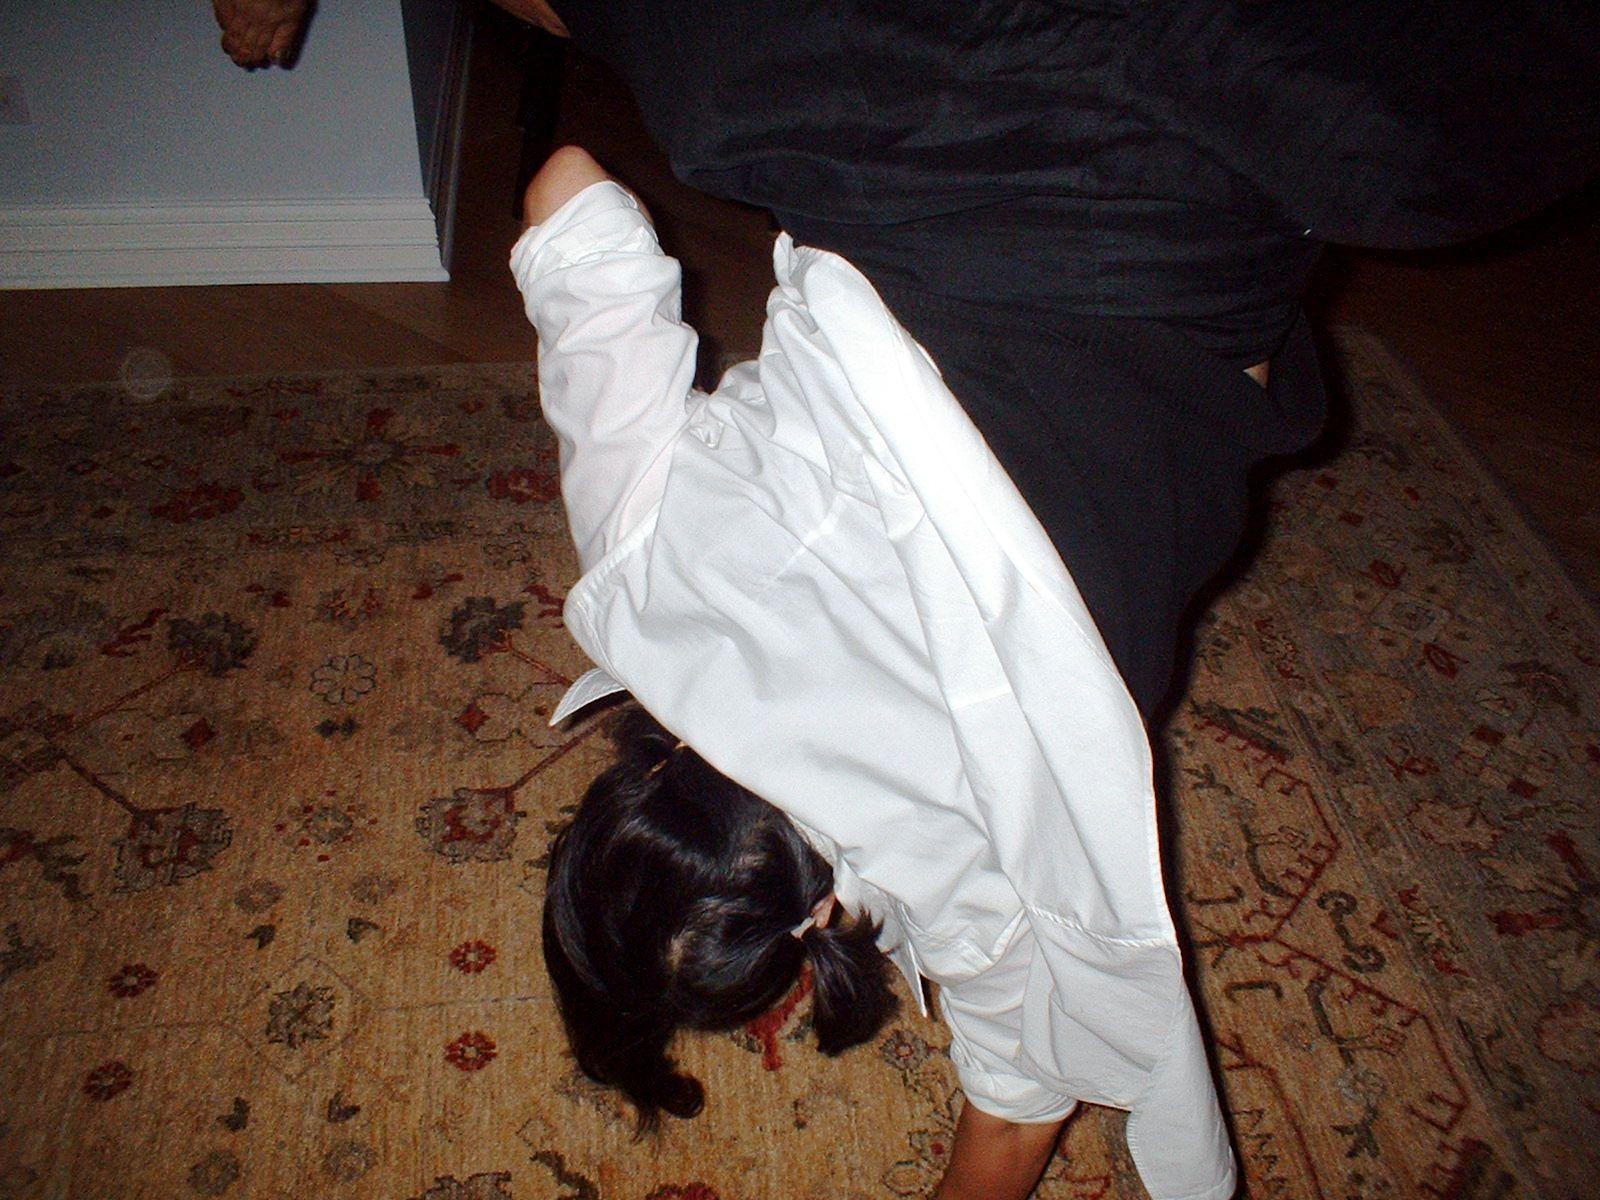 Girl upside down doing cartwheel.